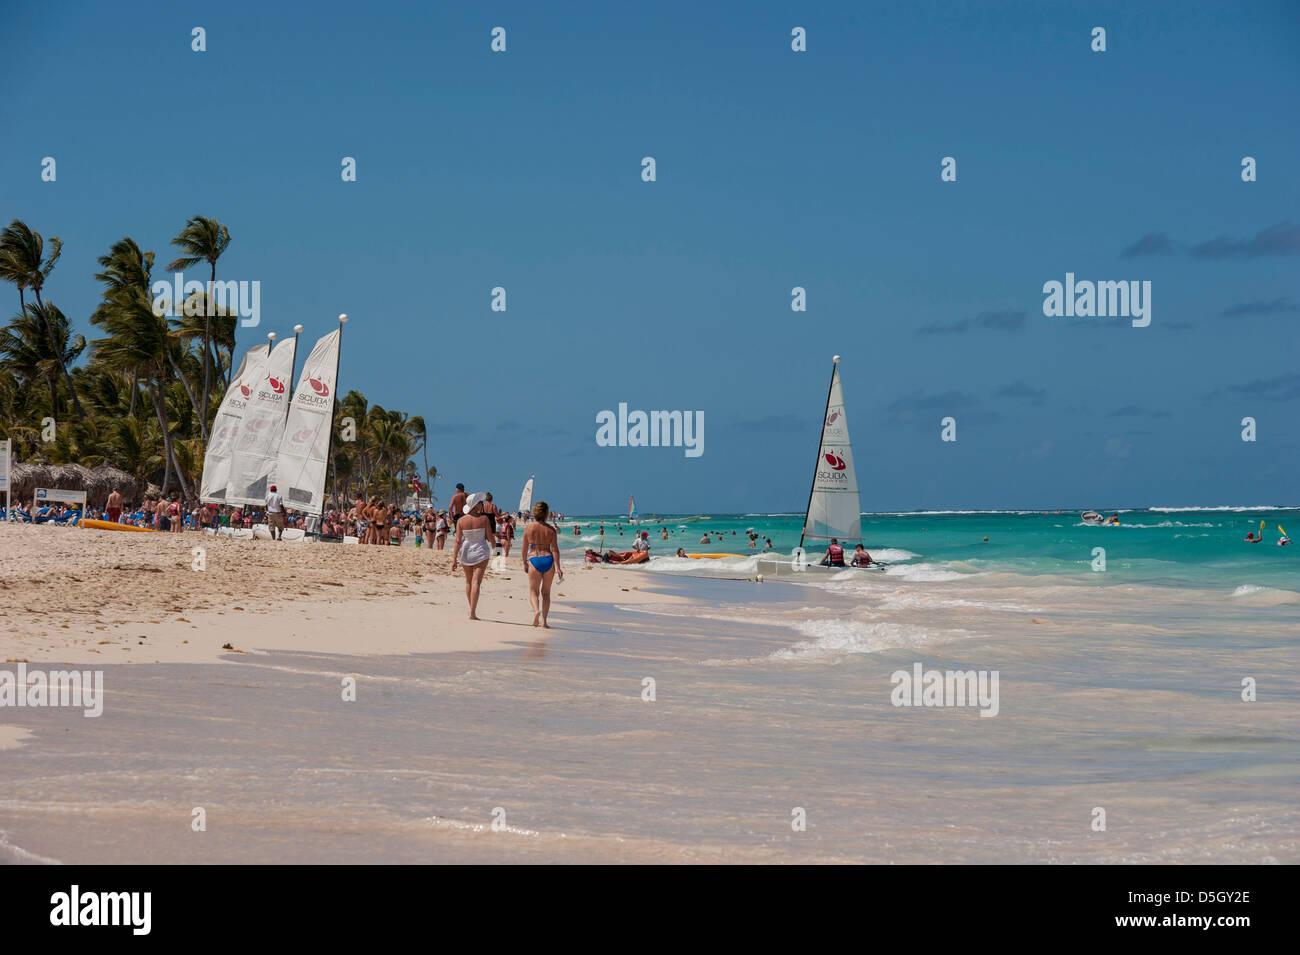 Dominican Republic Punta Cana Higuey Bavaro Beach People And Sailboats